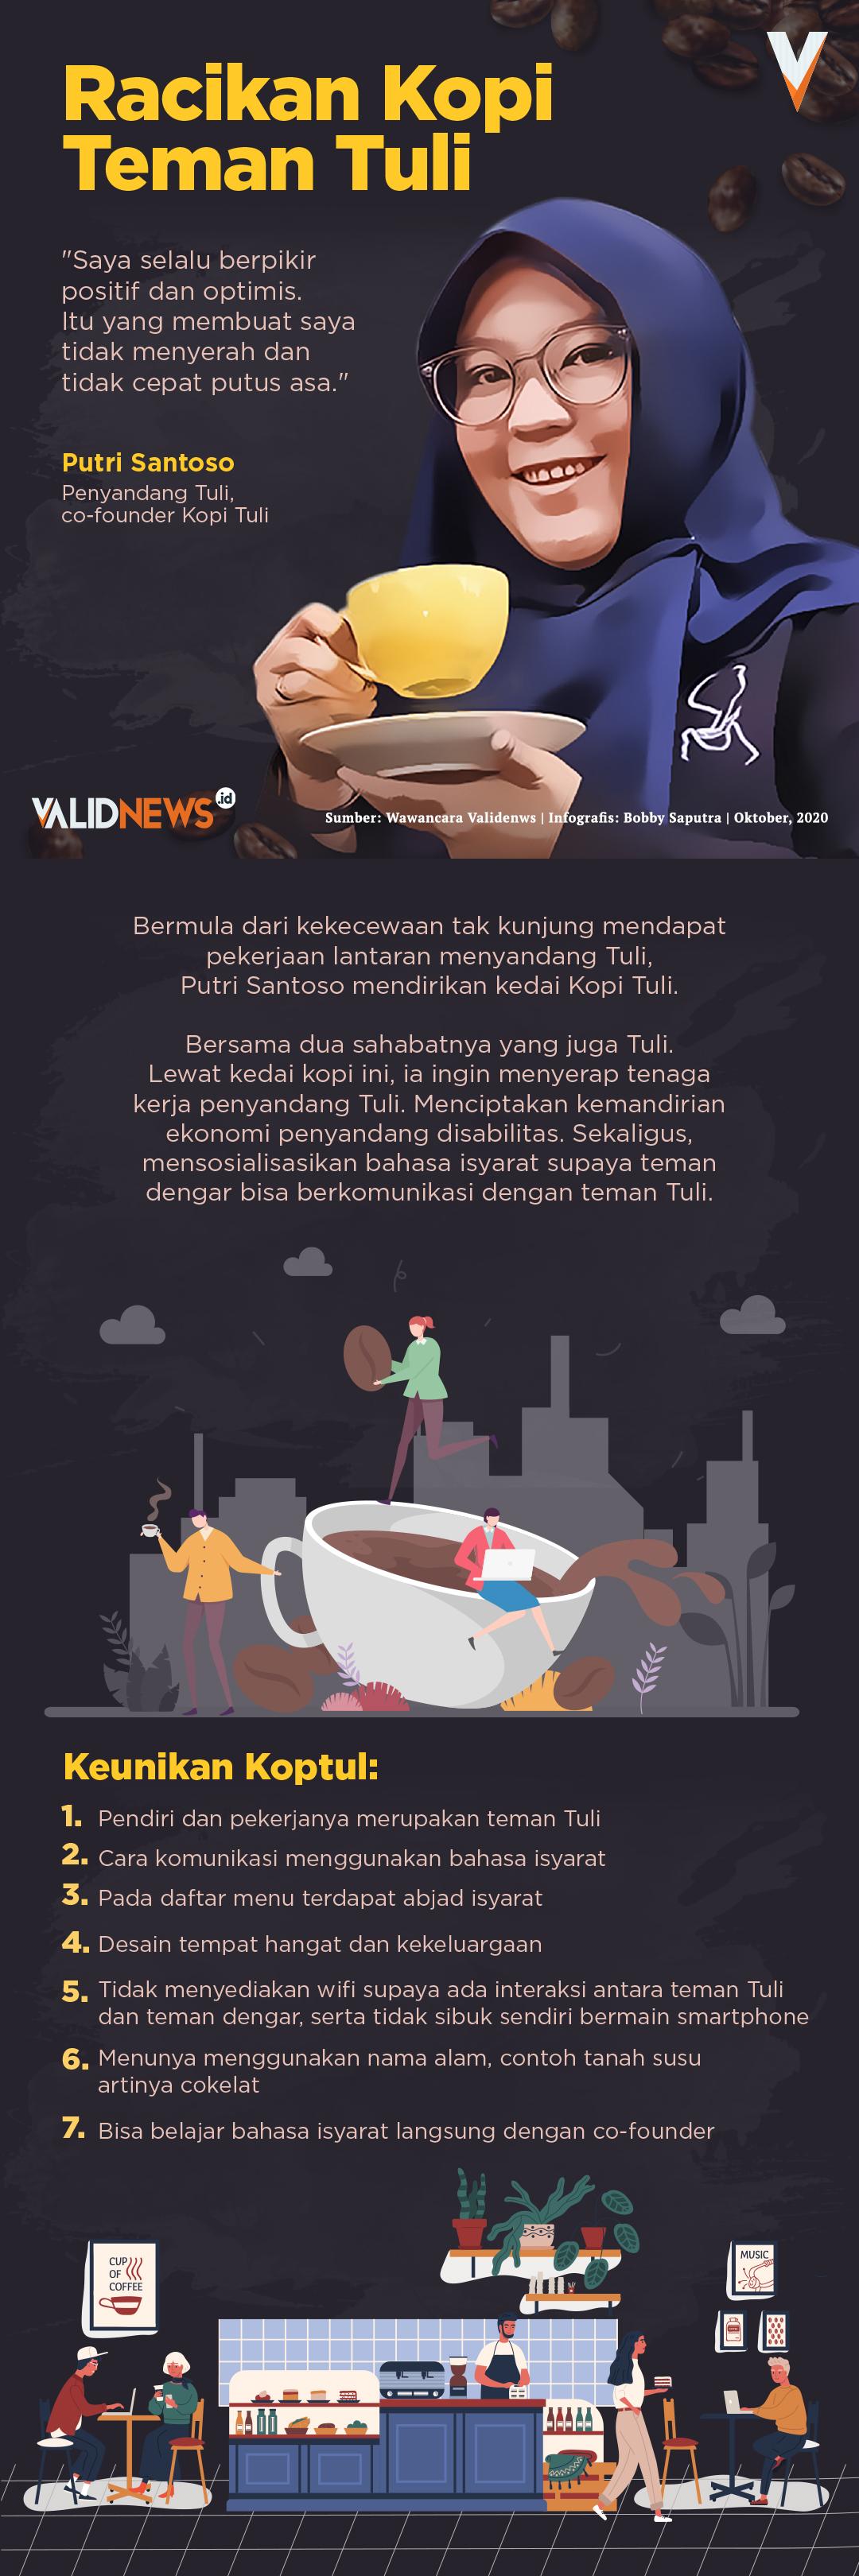 main content infografis